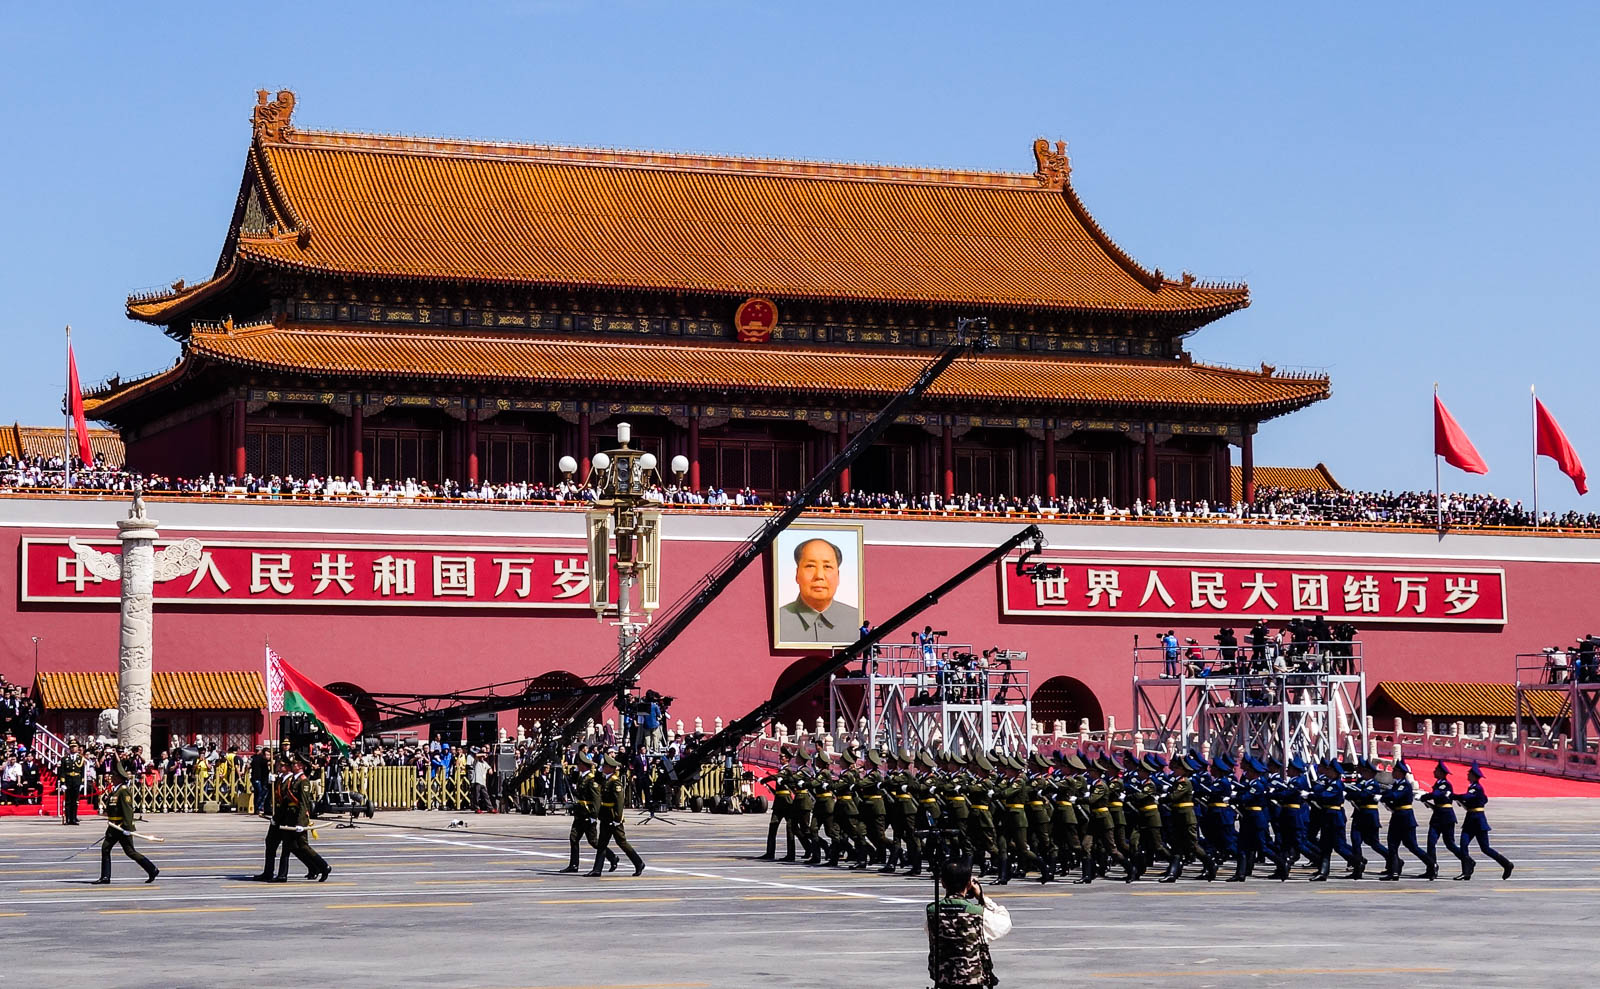 beijing-china-military-parade-2015-20